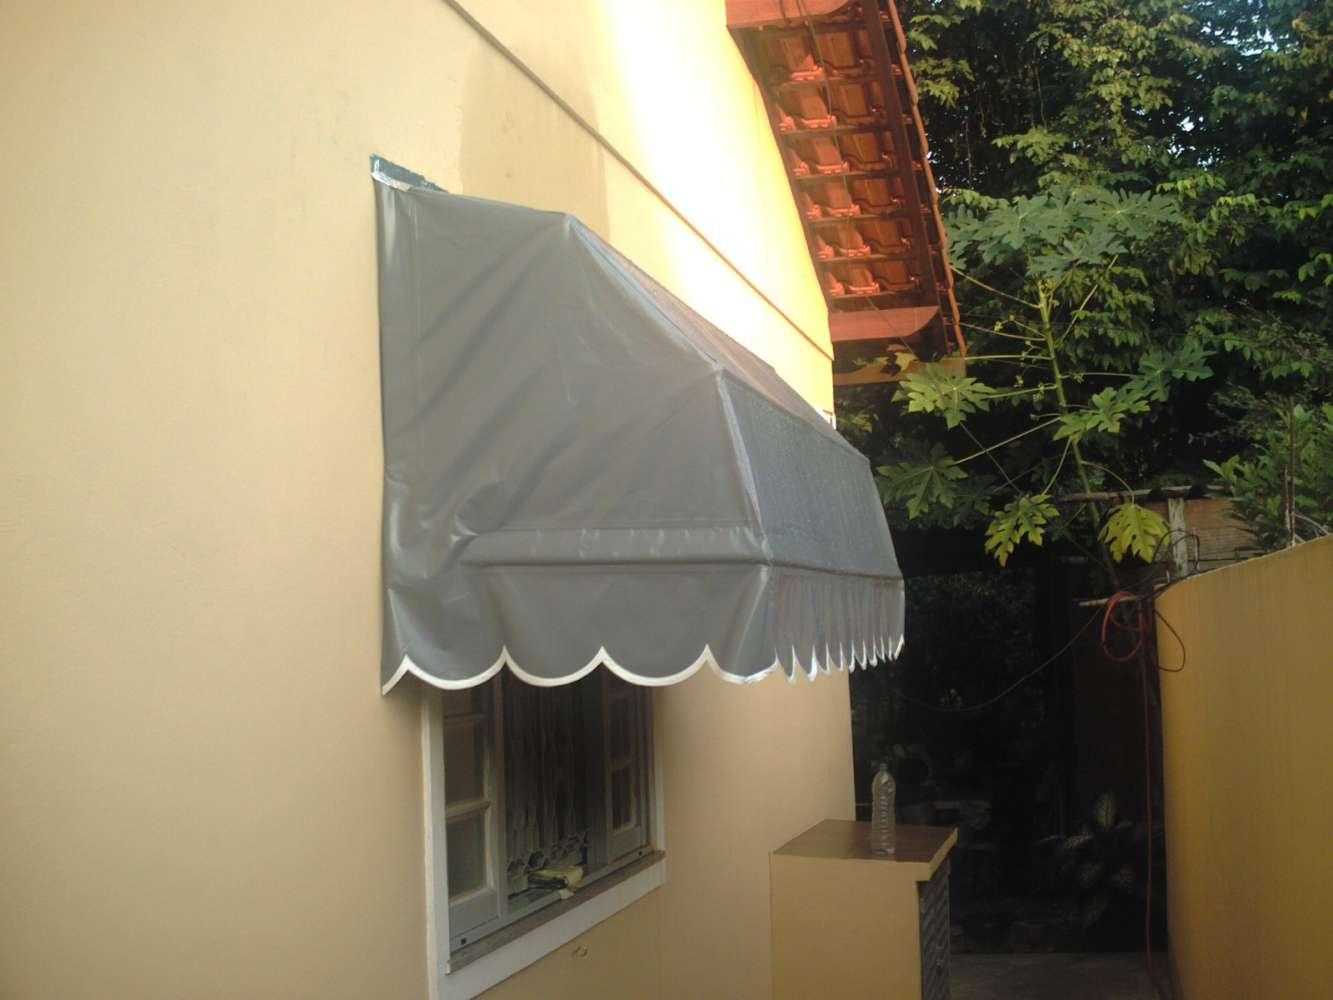 #A88E23 Toldo fixo para janelas Decorando Casas 1512 Toldos Para Janelas De Madeira